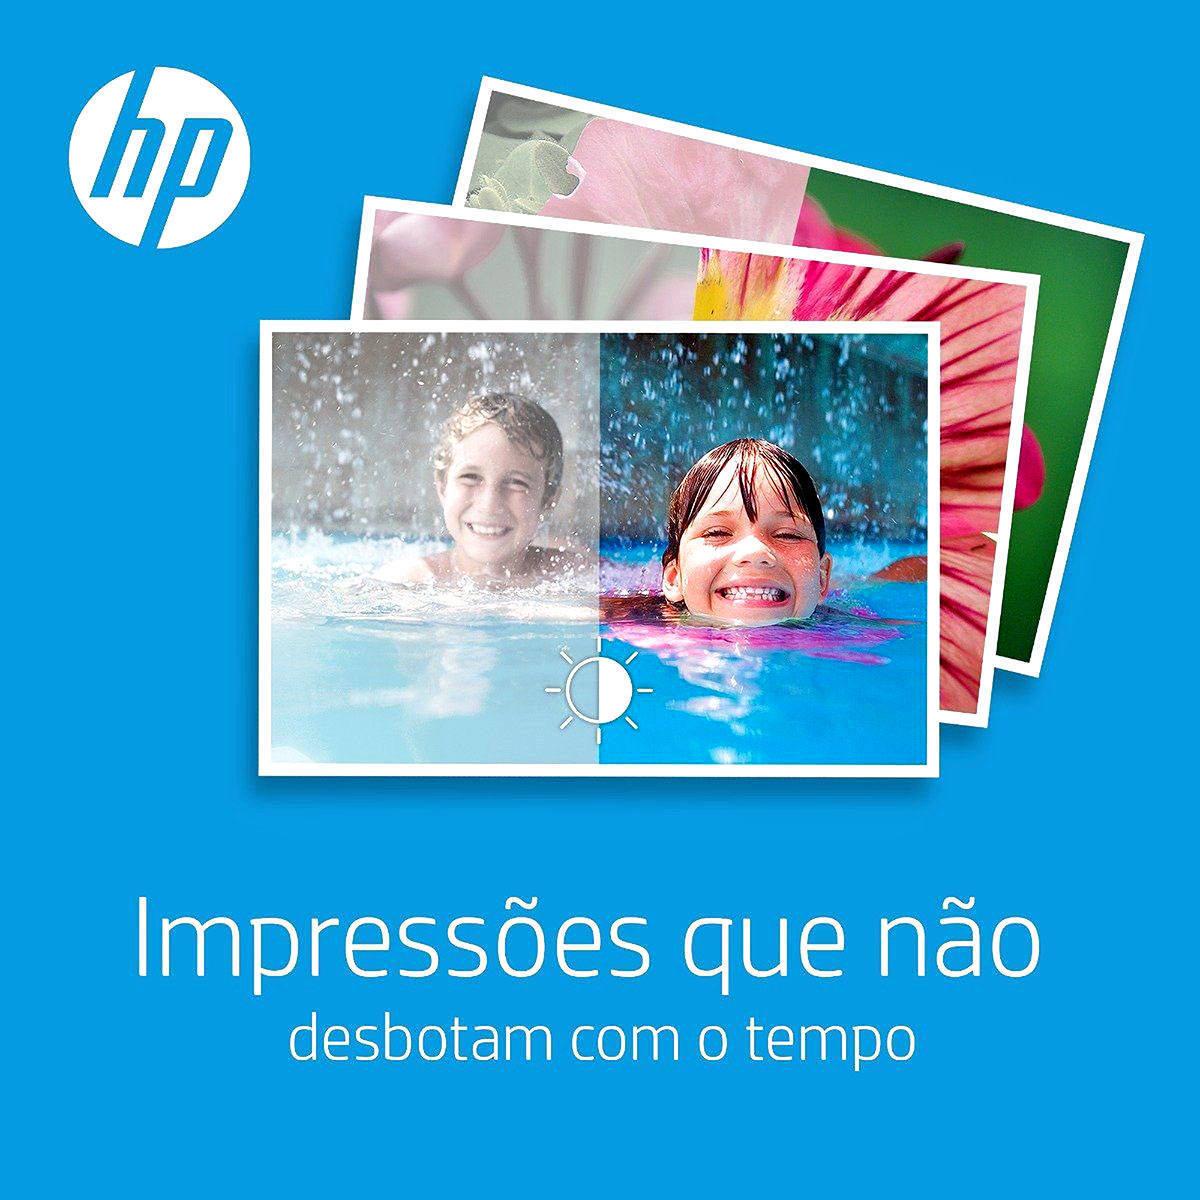 Cartucho de Tinta HP 122 Colorido CH562HB para HP Deskjet 1000 J110a 2000 J210a 2050 J510a 3050 J610a Original 2ml